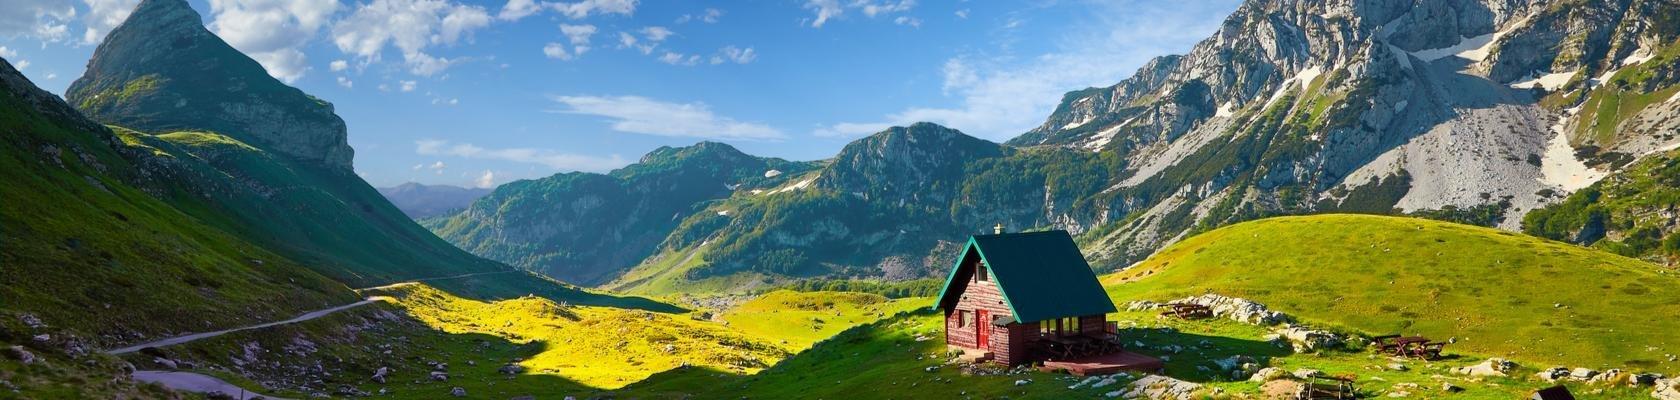 Nationaal Park Durmitor (Montenegro)